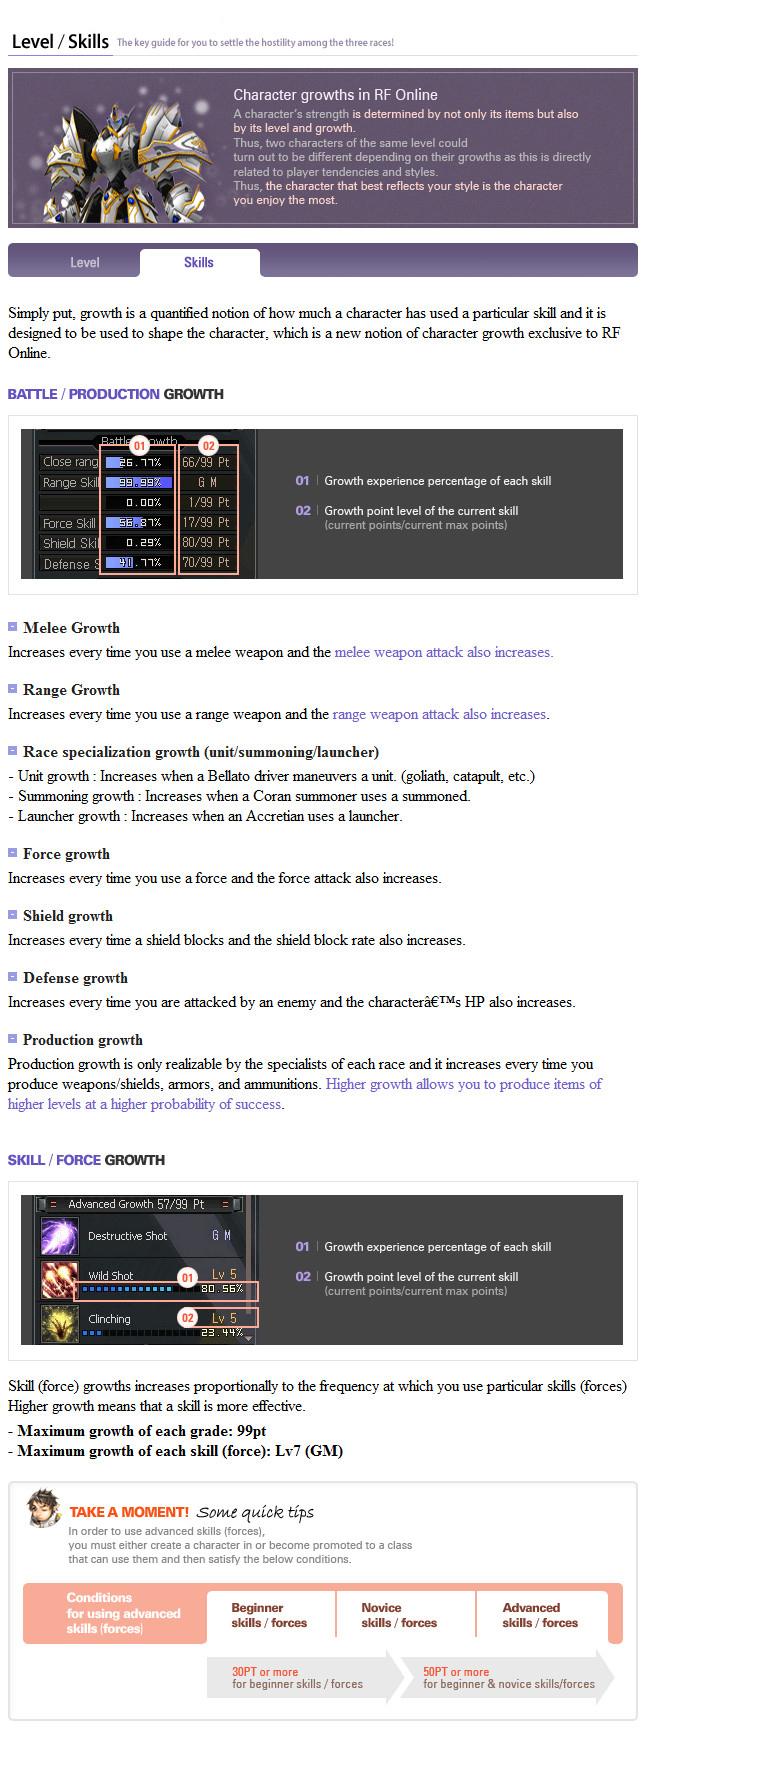 Rf online bellato pt guide